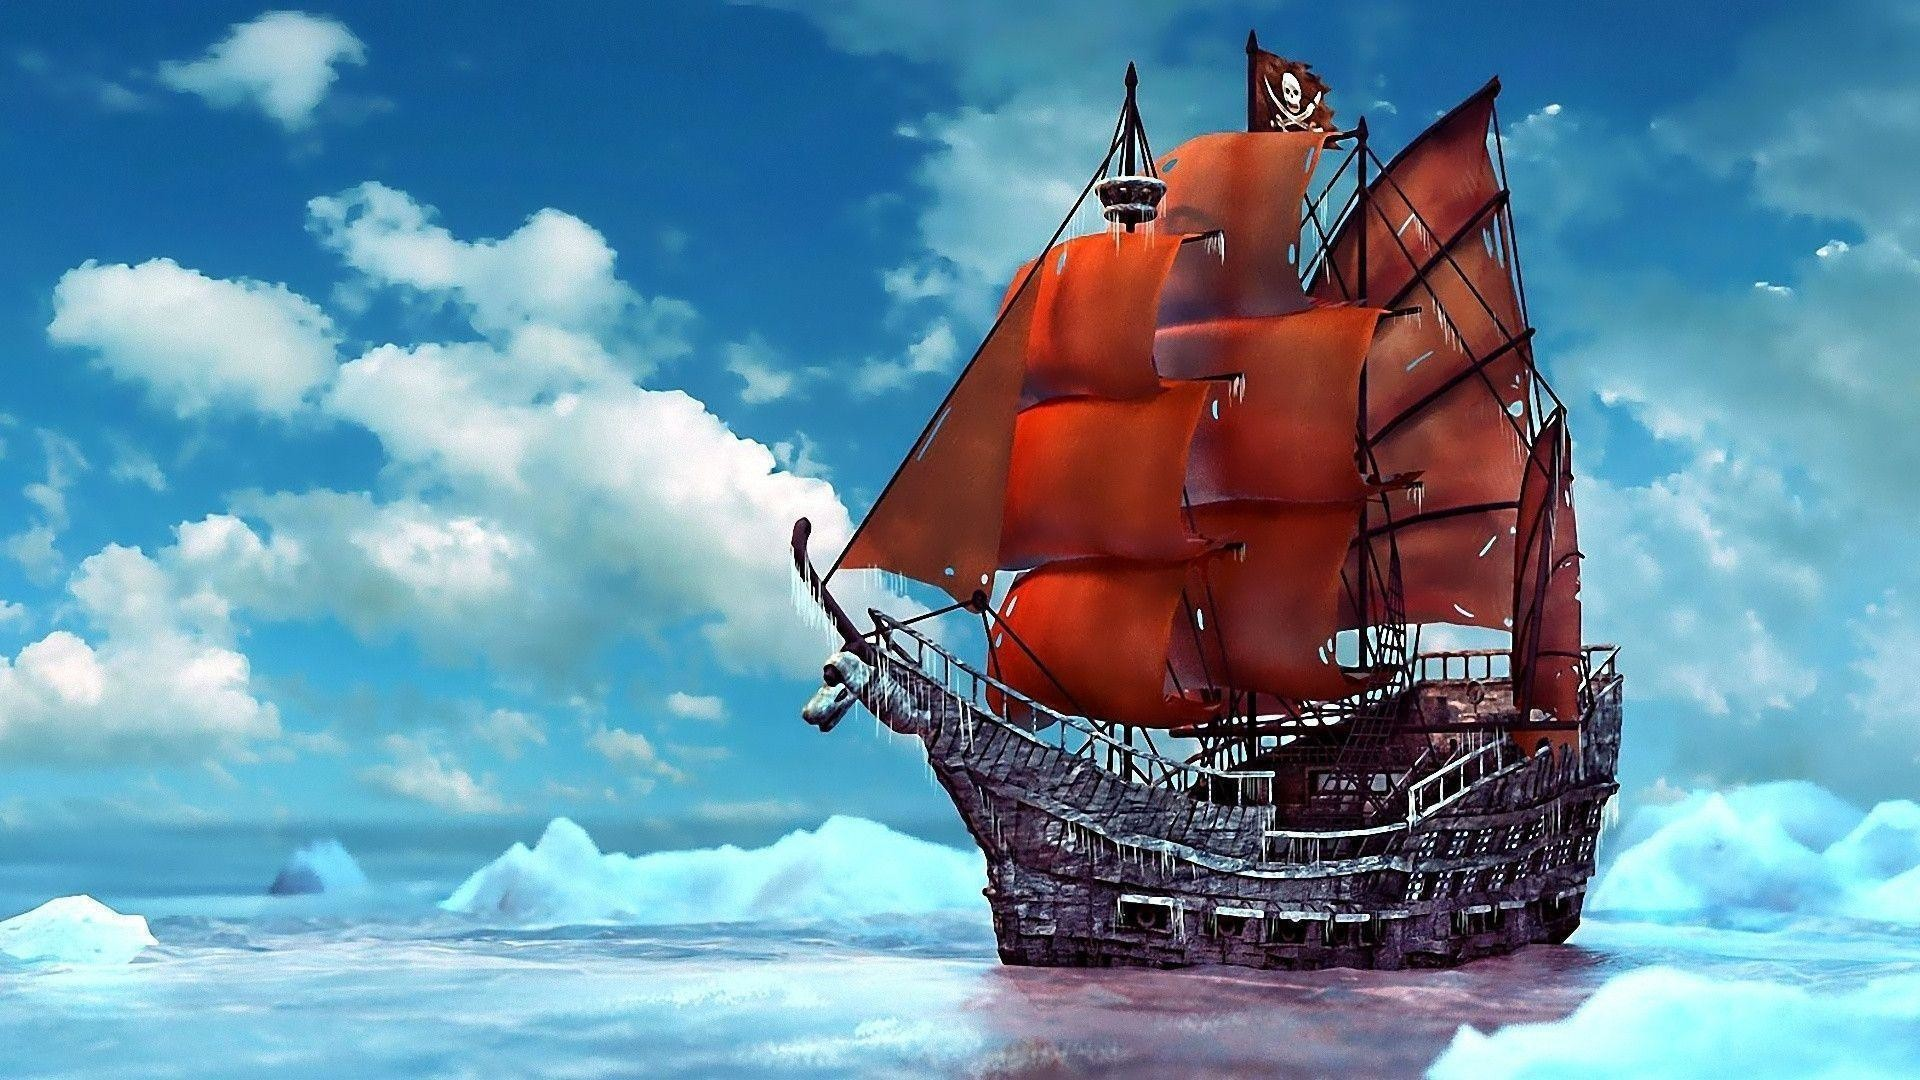 Pirate Ships Wallpaper, City & Travel Wallpaper, hd phone .